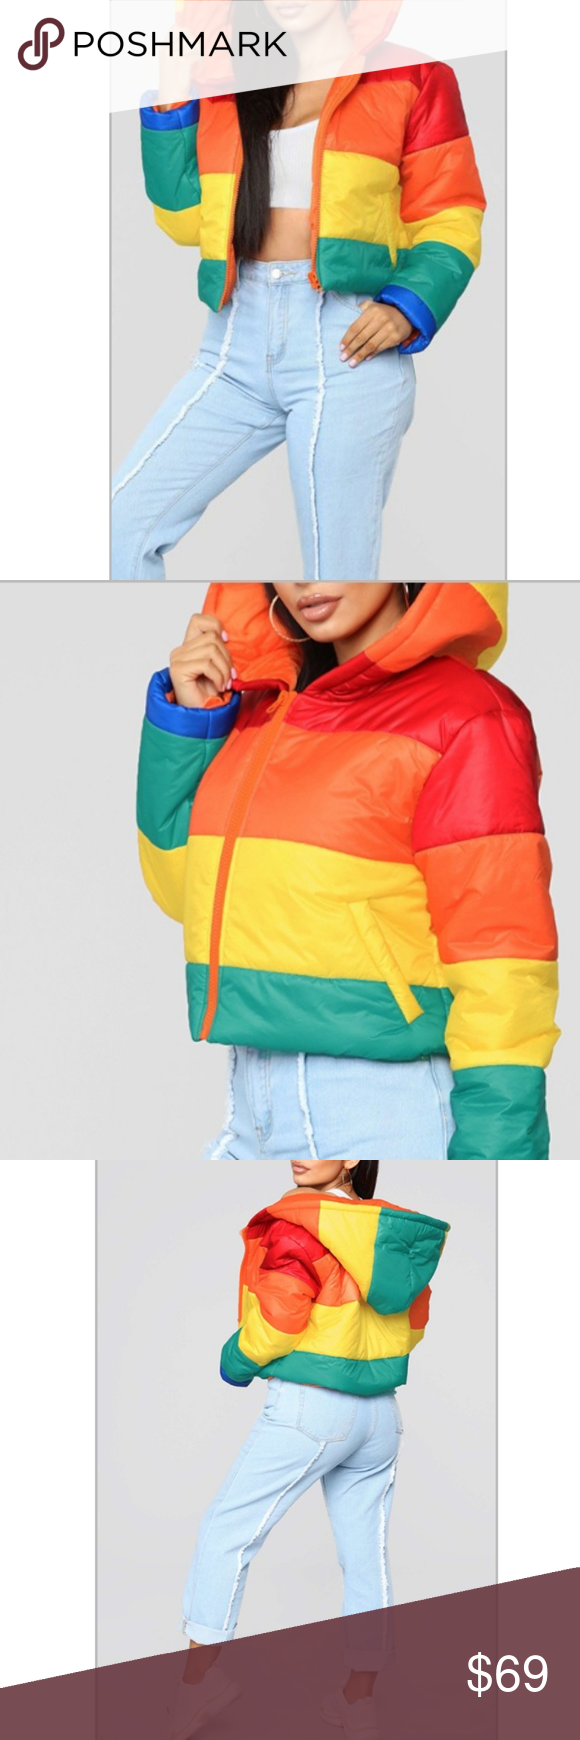 Rainbow Striped Puffer Coat 70 S Throwback Clothes Design Fashion Design Puffer Coat [ 1740 x 580 Pixel ]